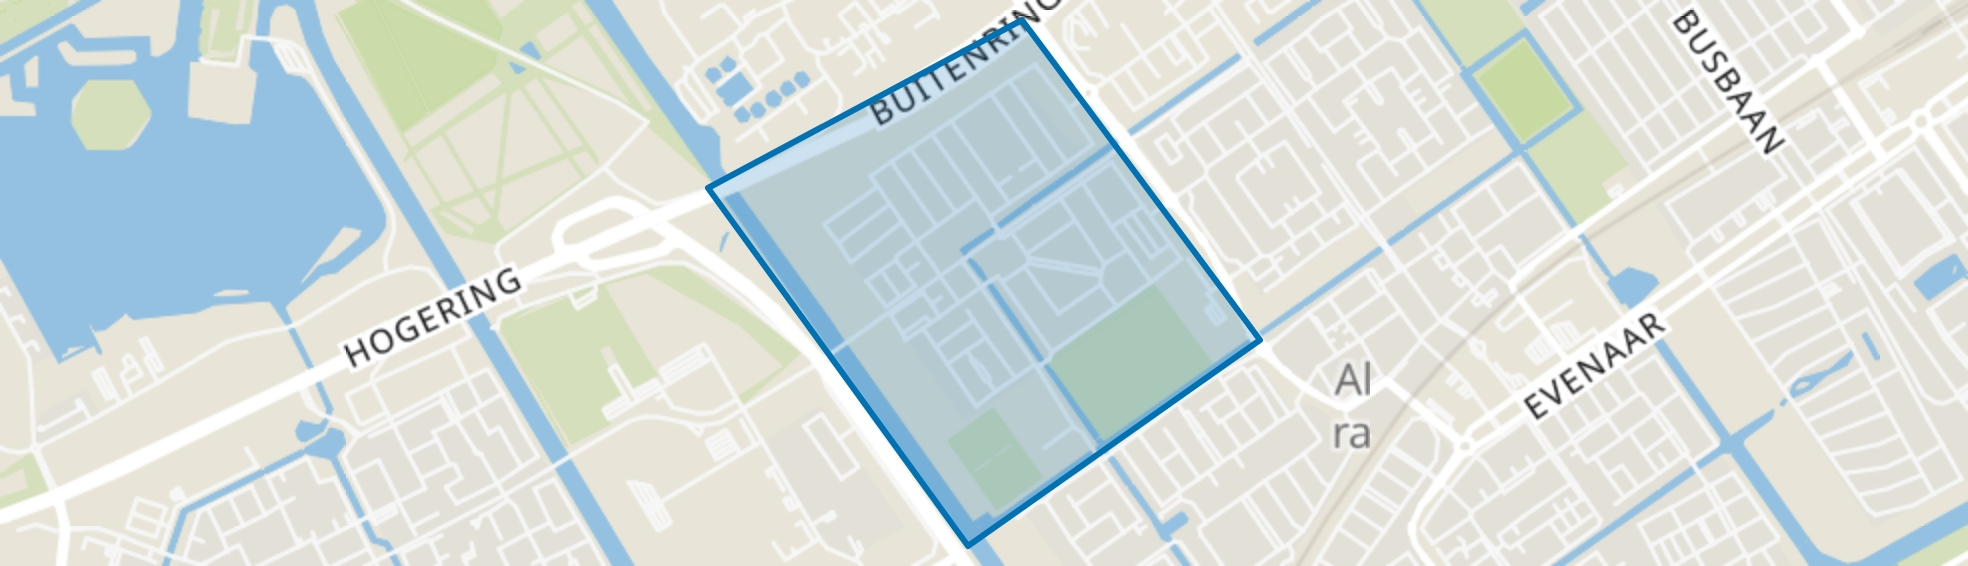 Bouwmeesterbuurt, Almere map